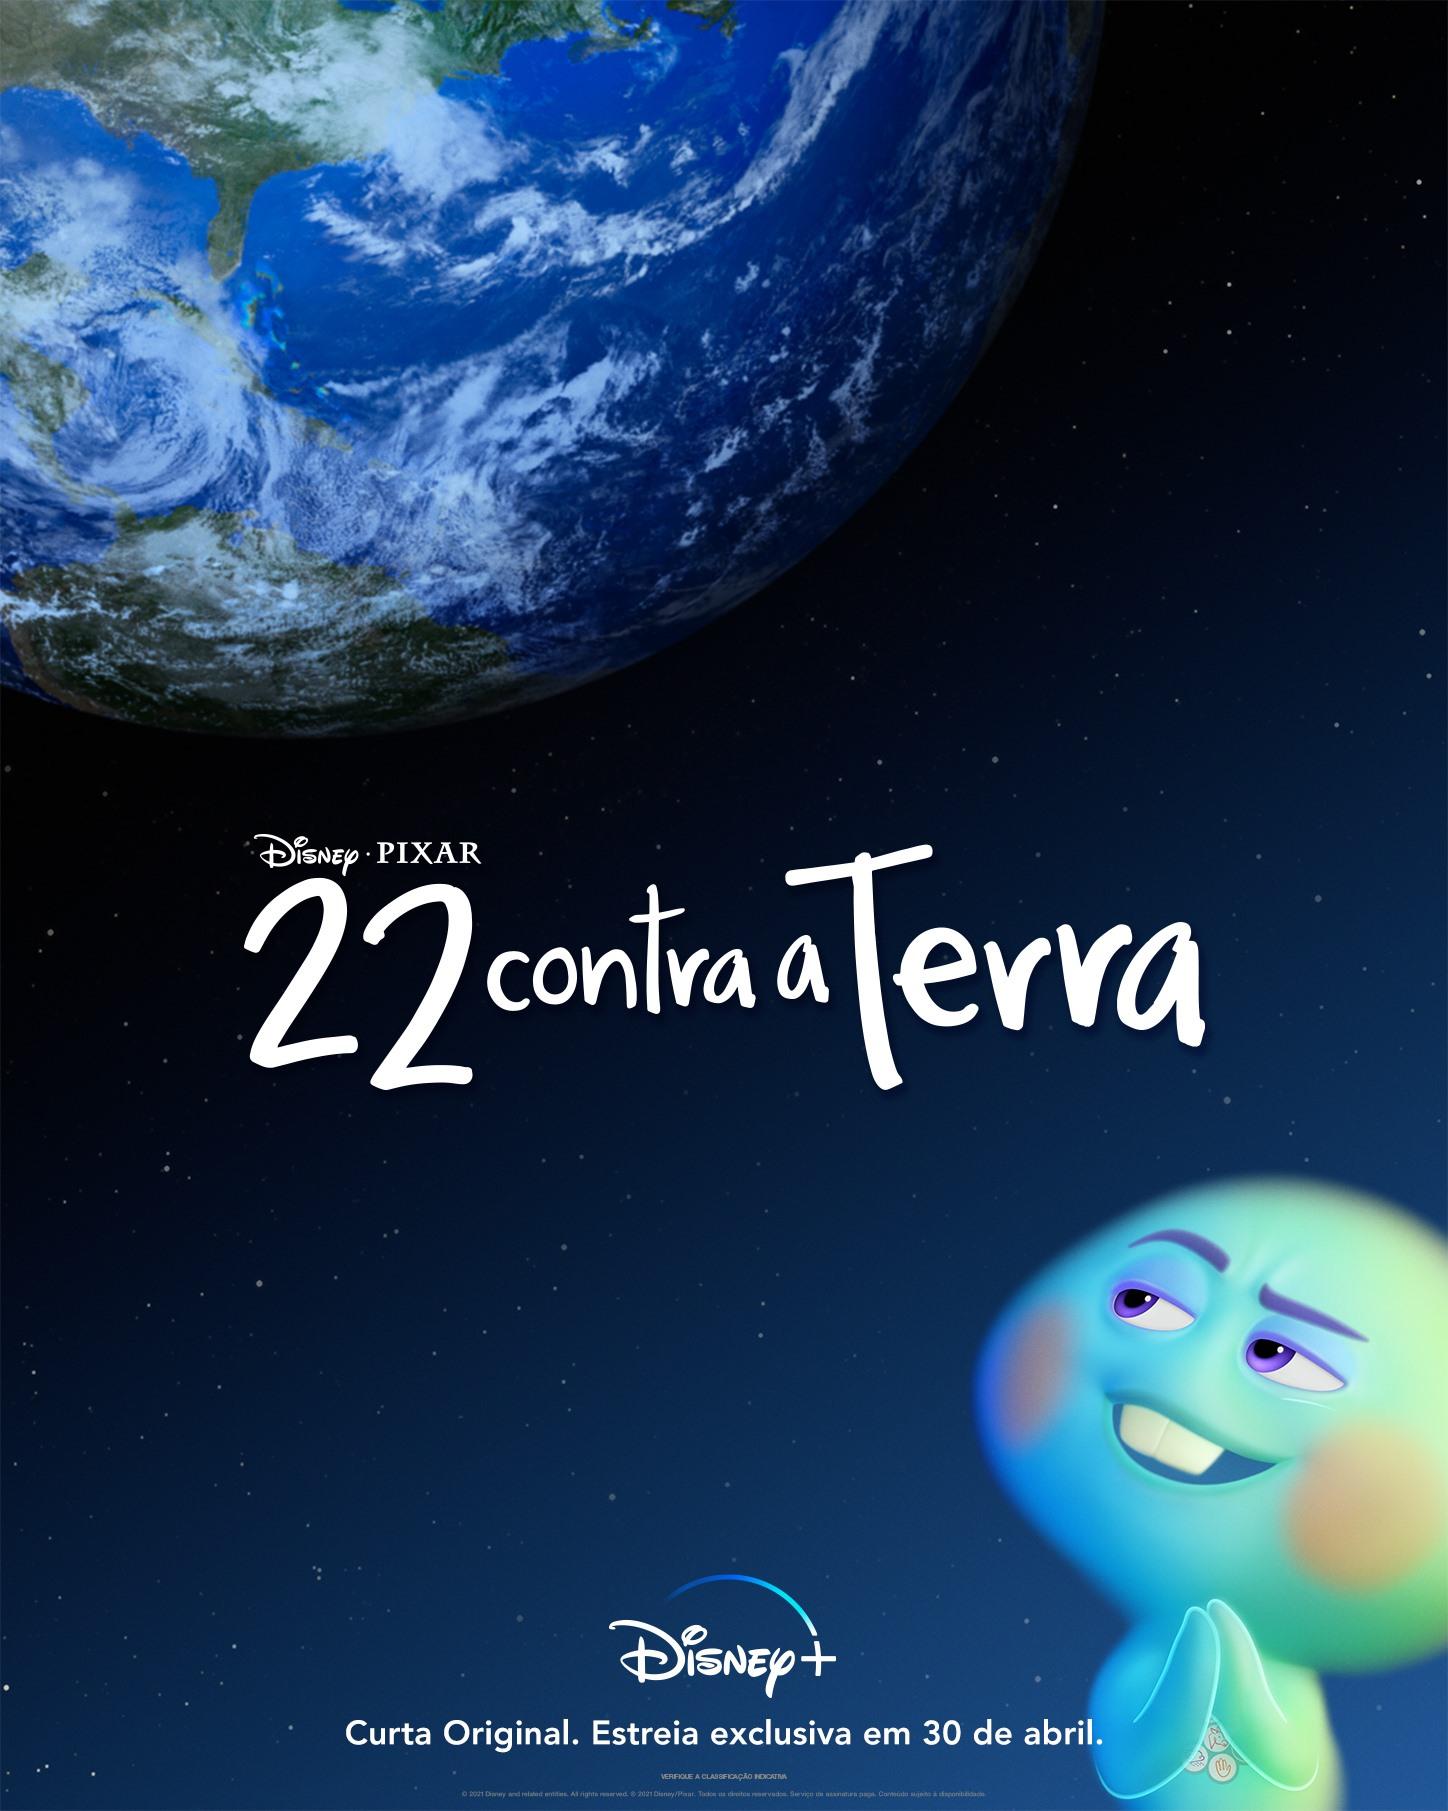 cartaz 22 contra terra no Disney+